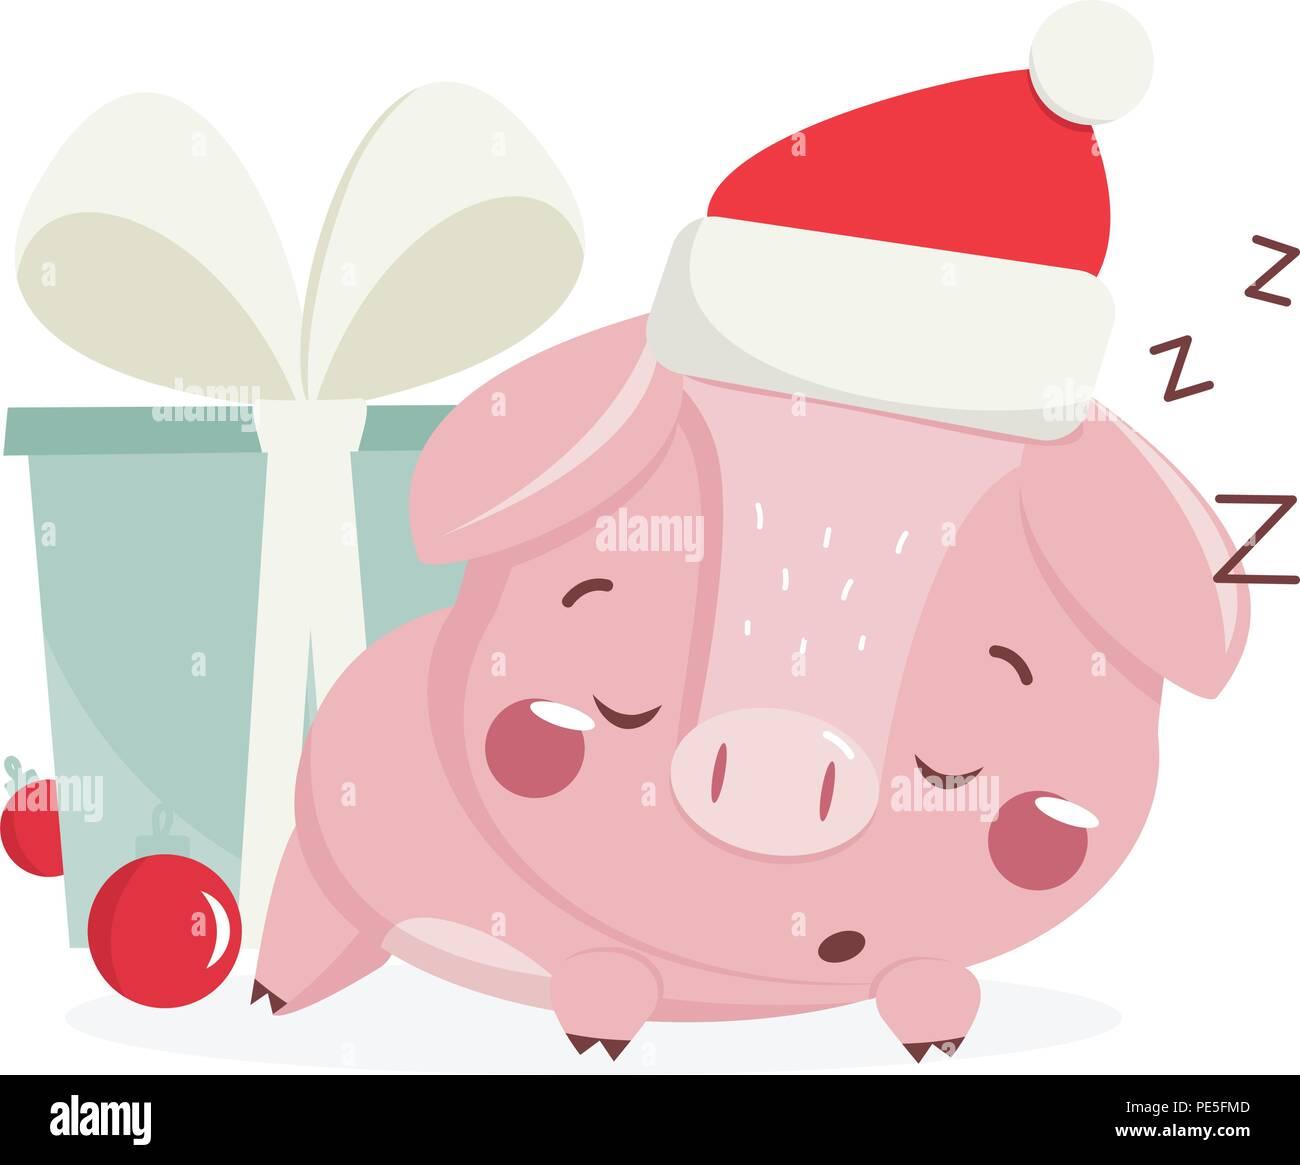 Chinese New Year 2019 Pig Stock Photos Chinese New Year 2019 Pig